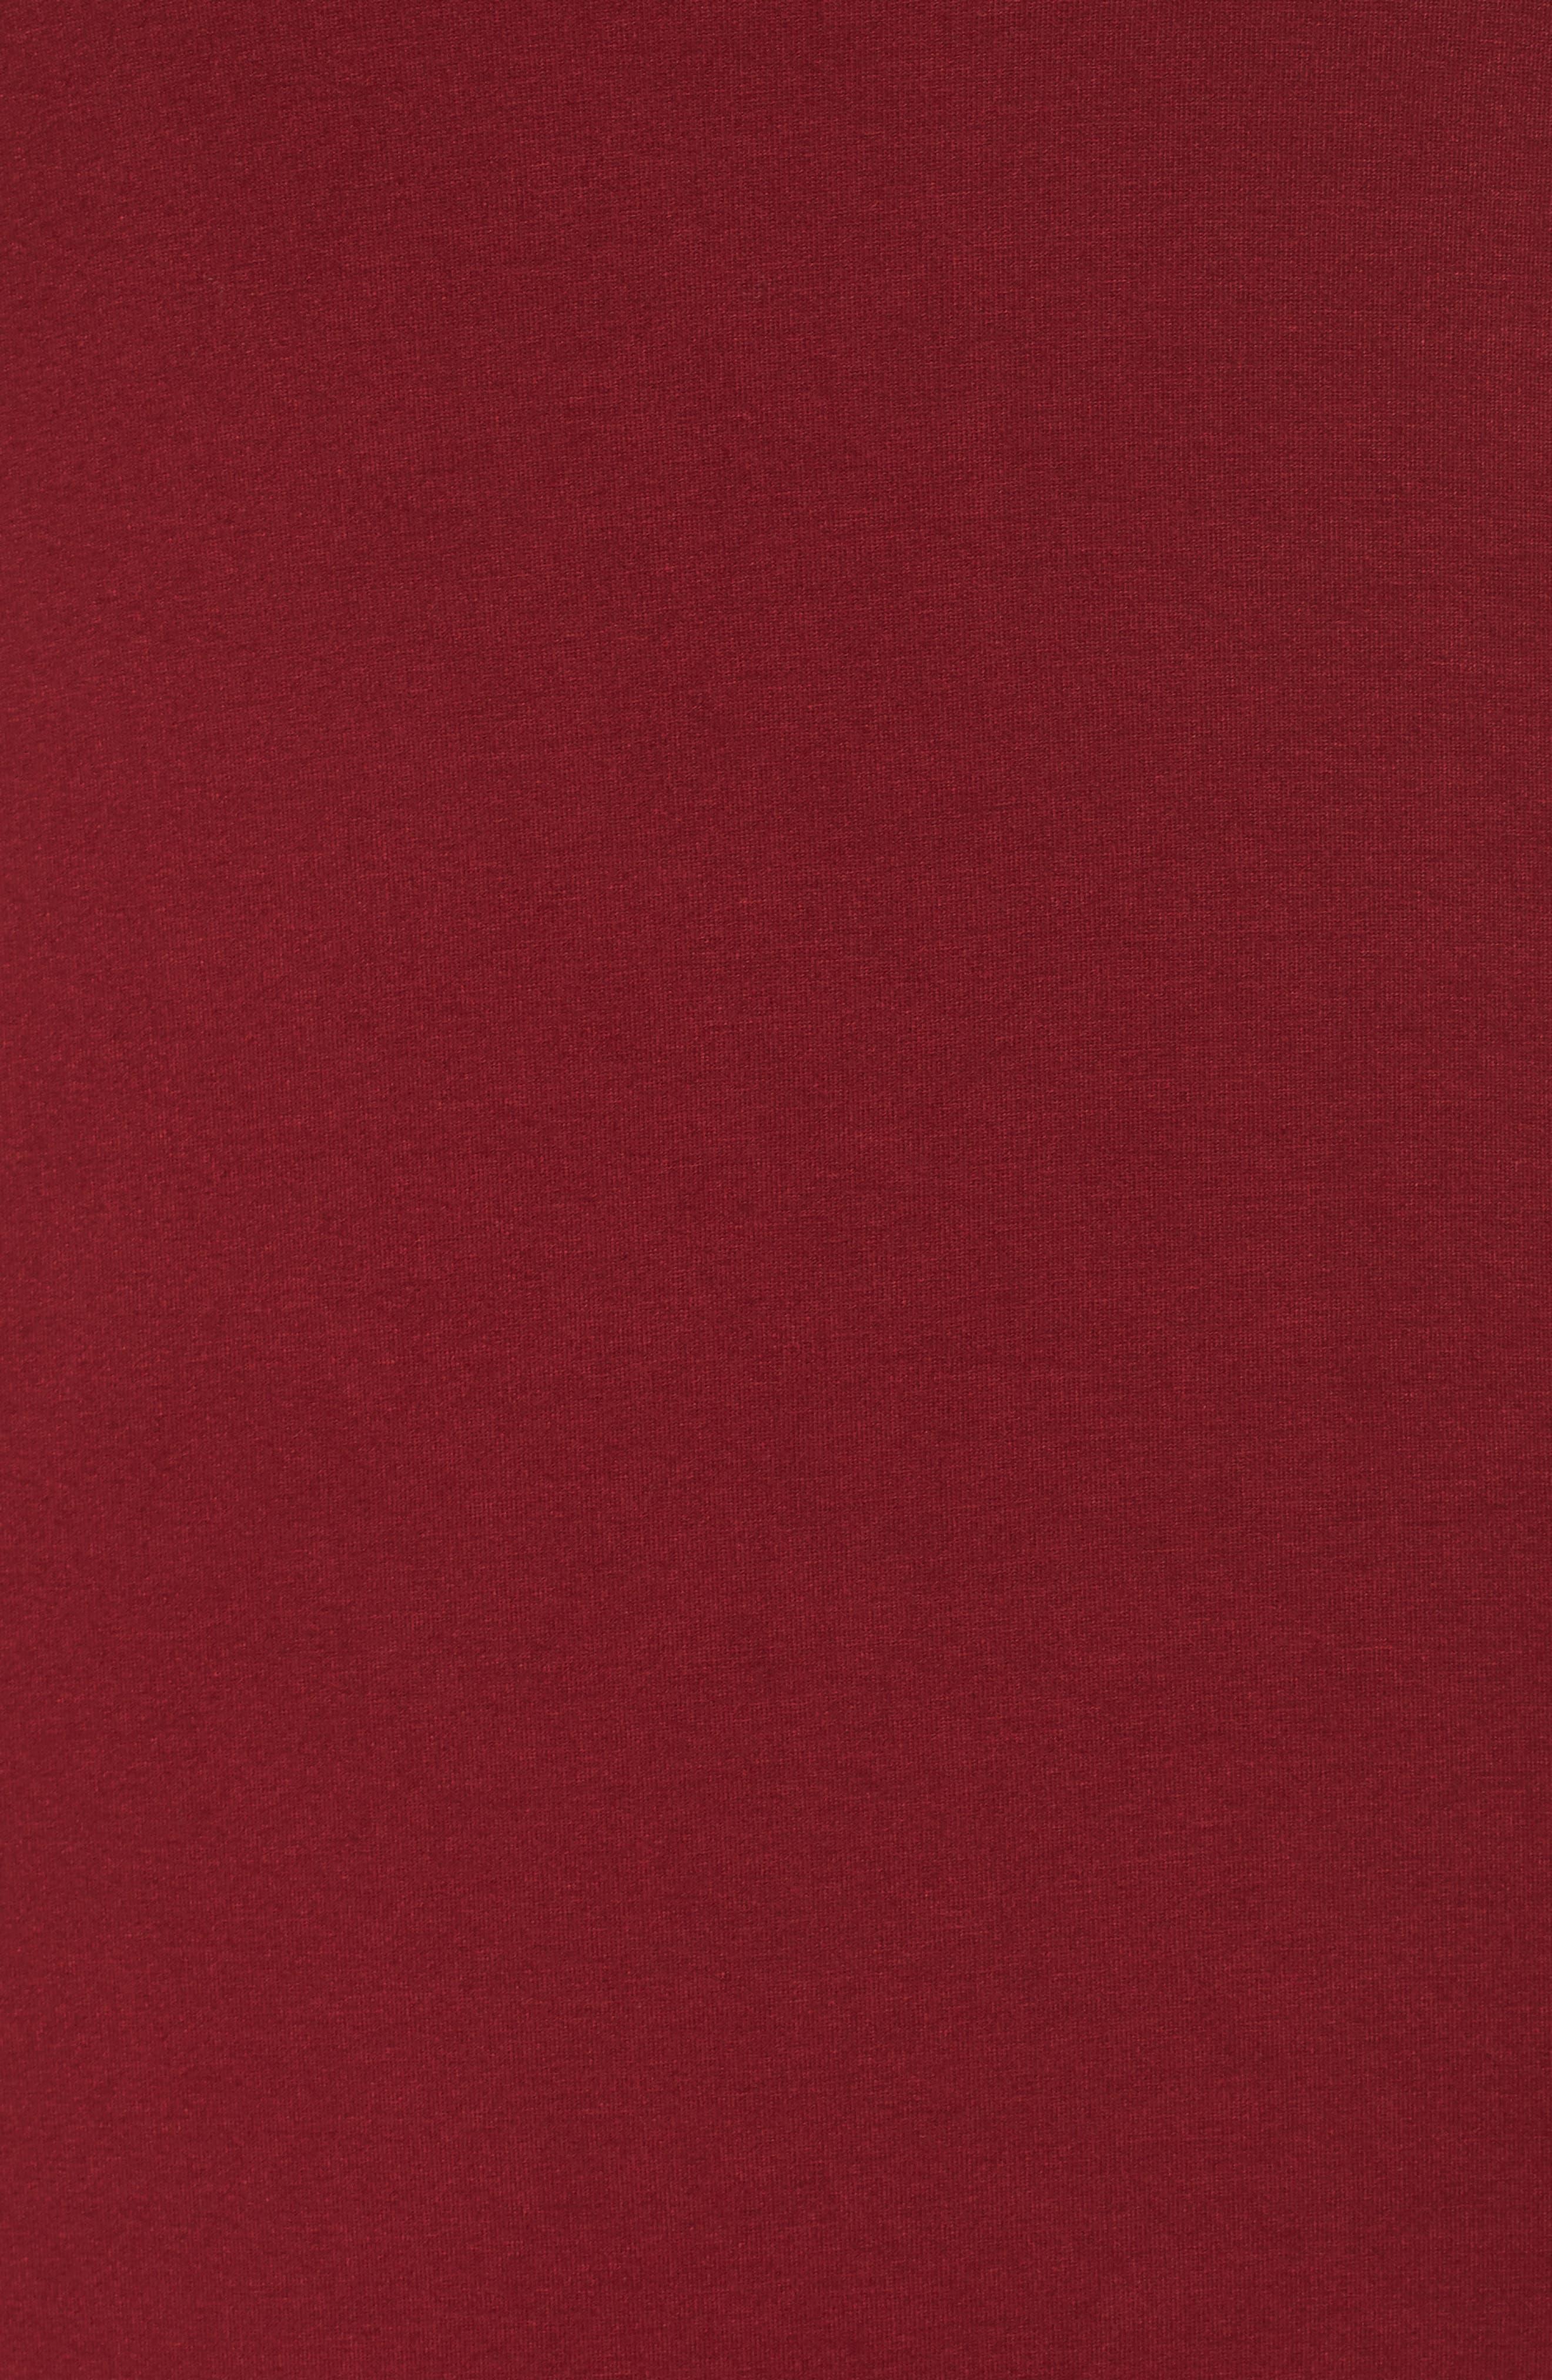 Tie Strap Knit Maxi Dress,                             Alternate thumbnail 6, color,                             606